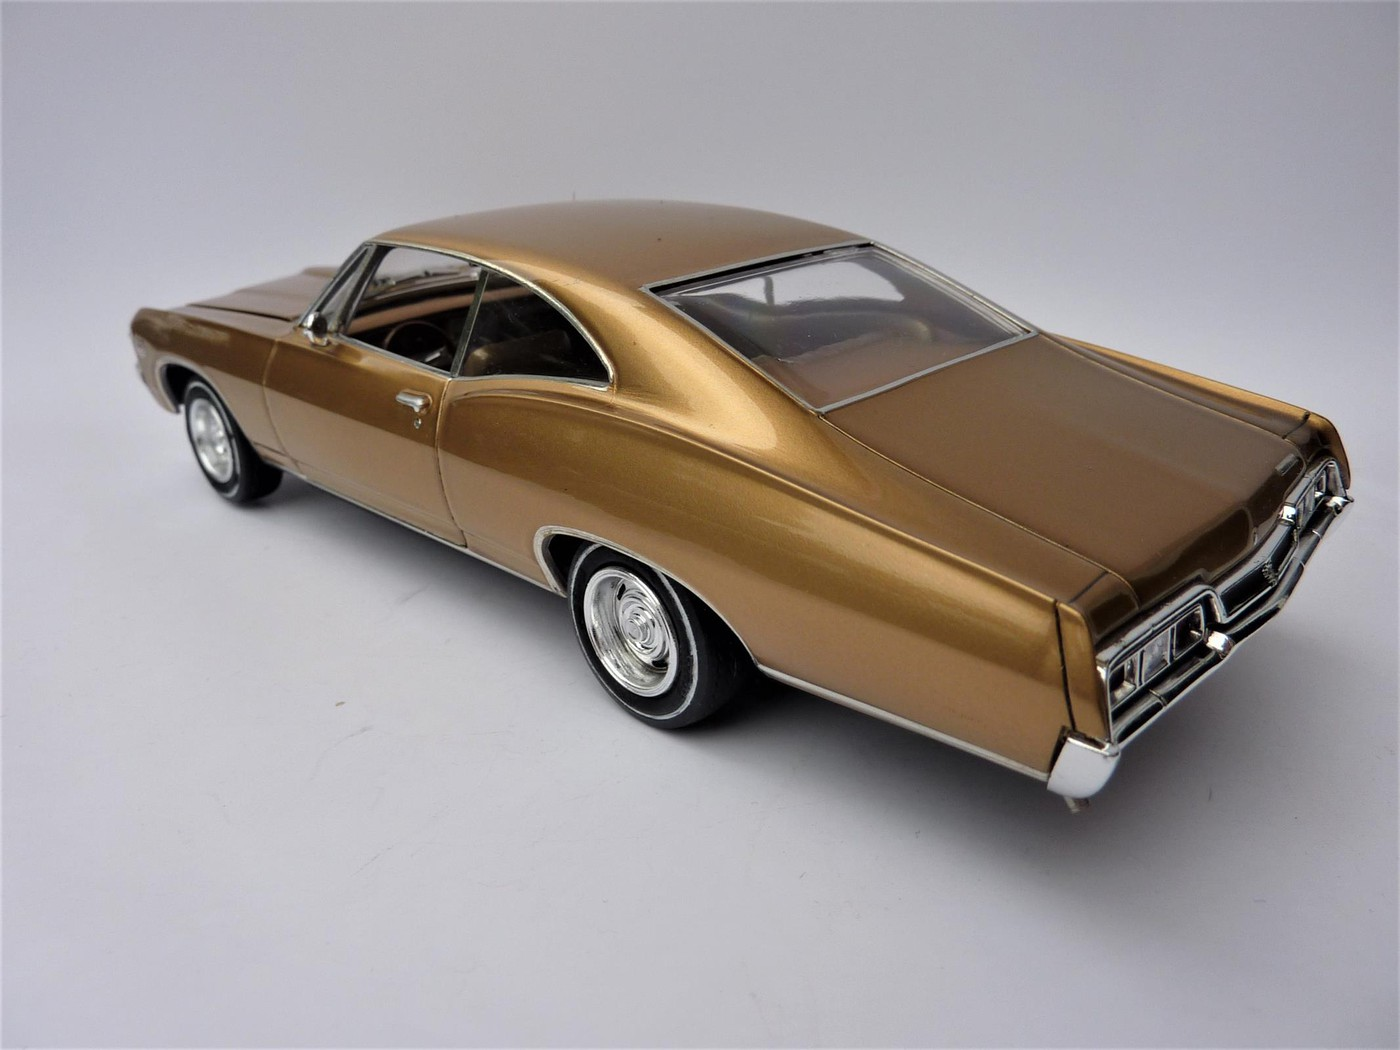 Chevrolet Impala 67 Términée Photo4-vi